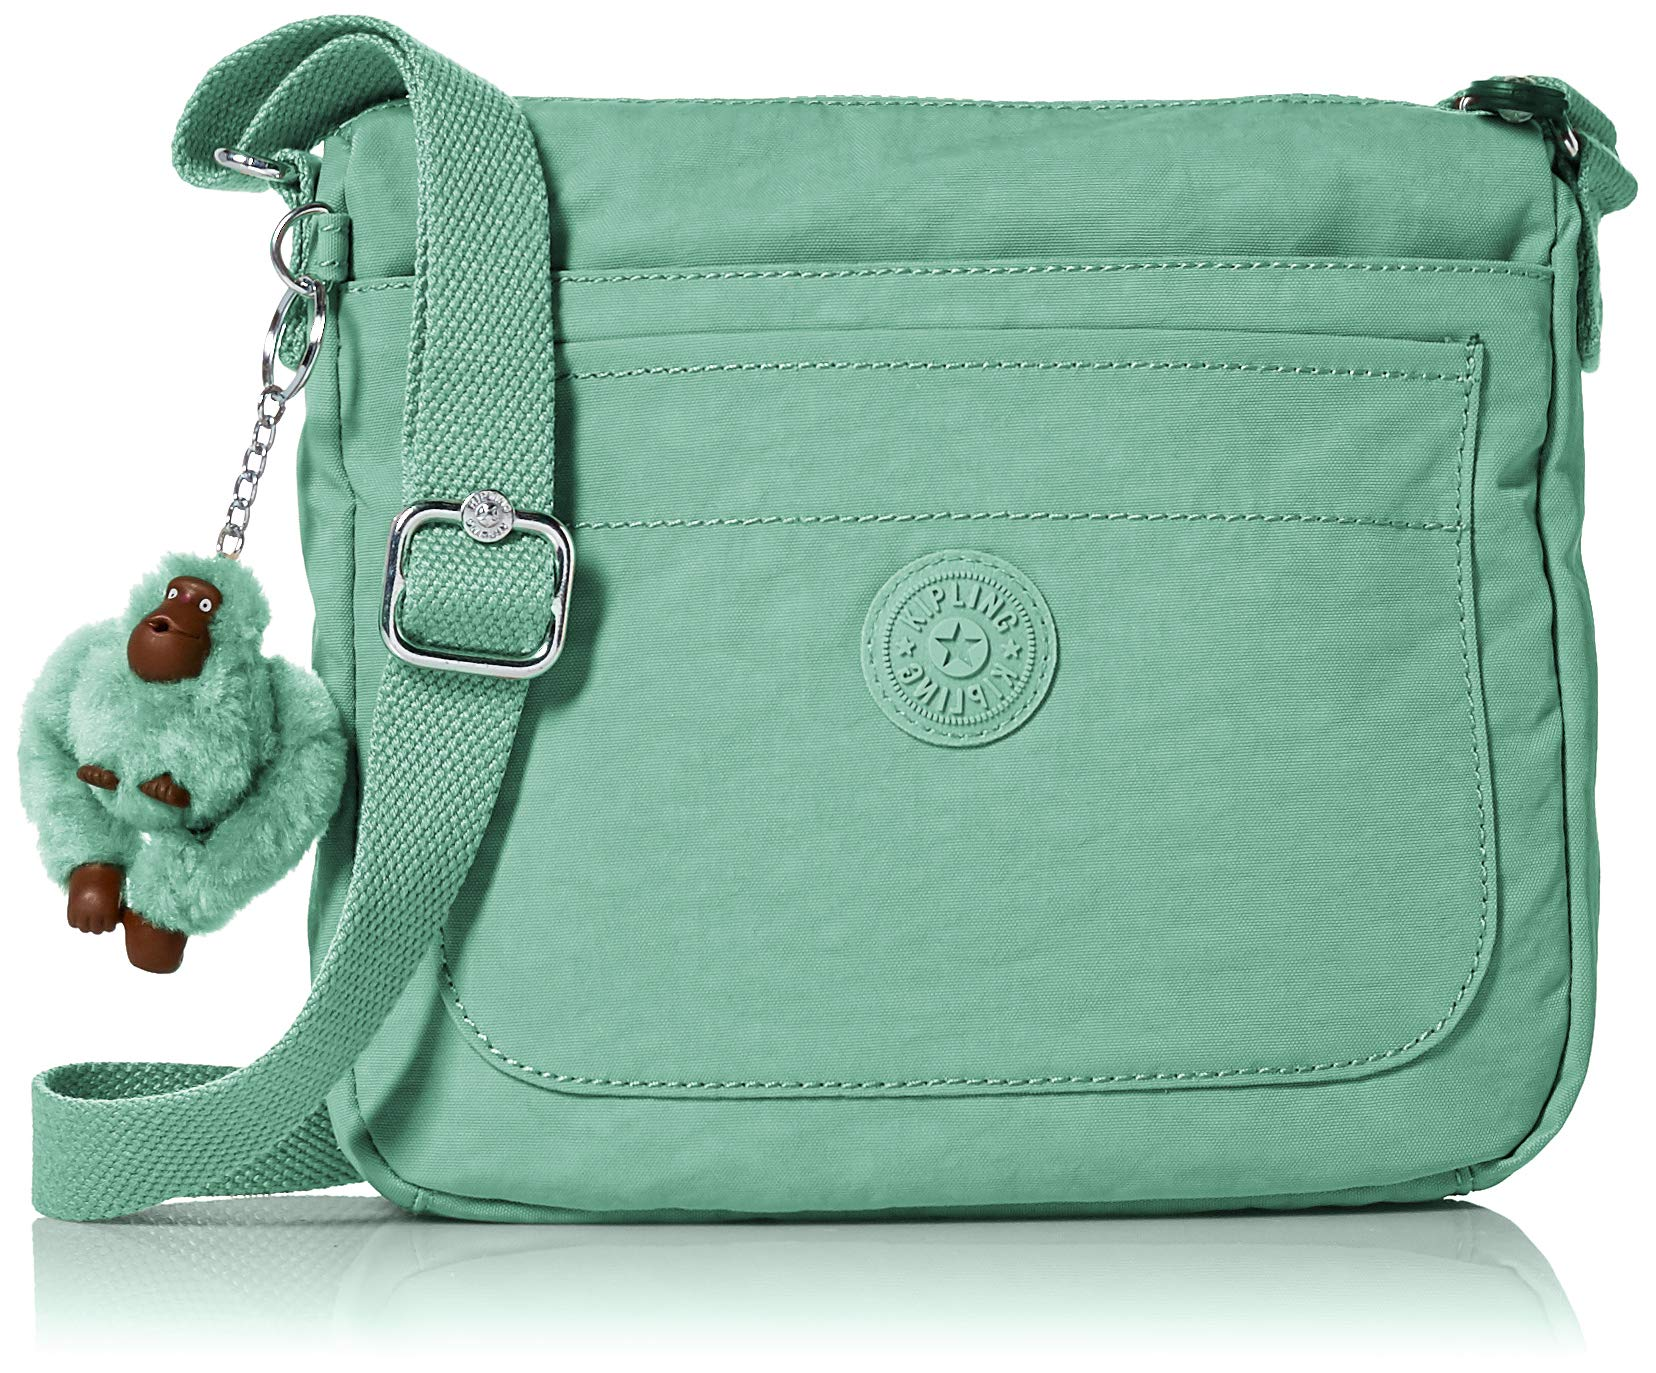 Kipling Women's Sebastian Bag, Adjustable Crossbody Strap, Top Zip Closure, Fern Green Tonal